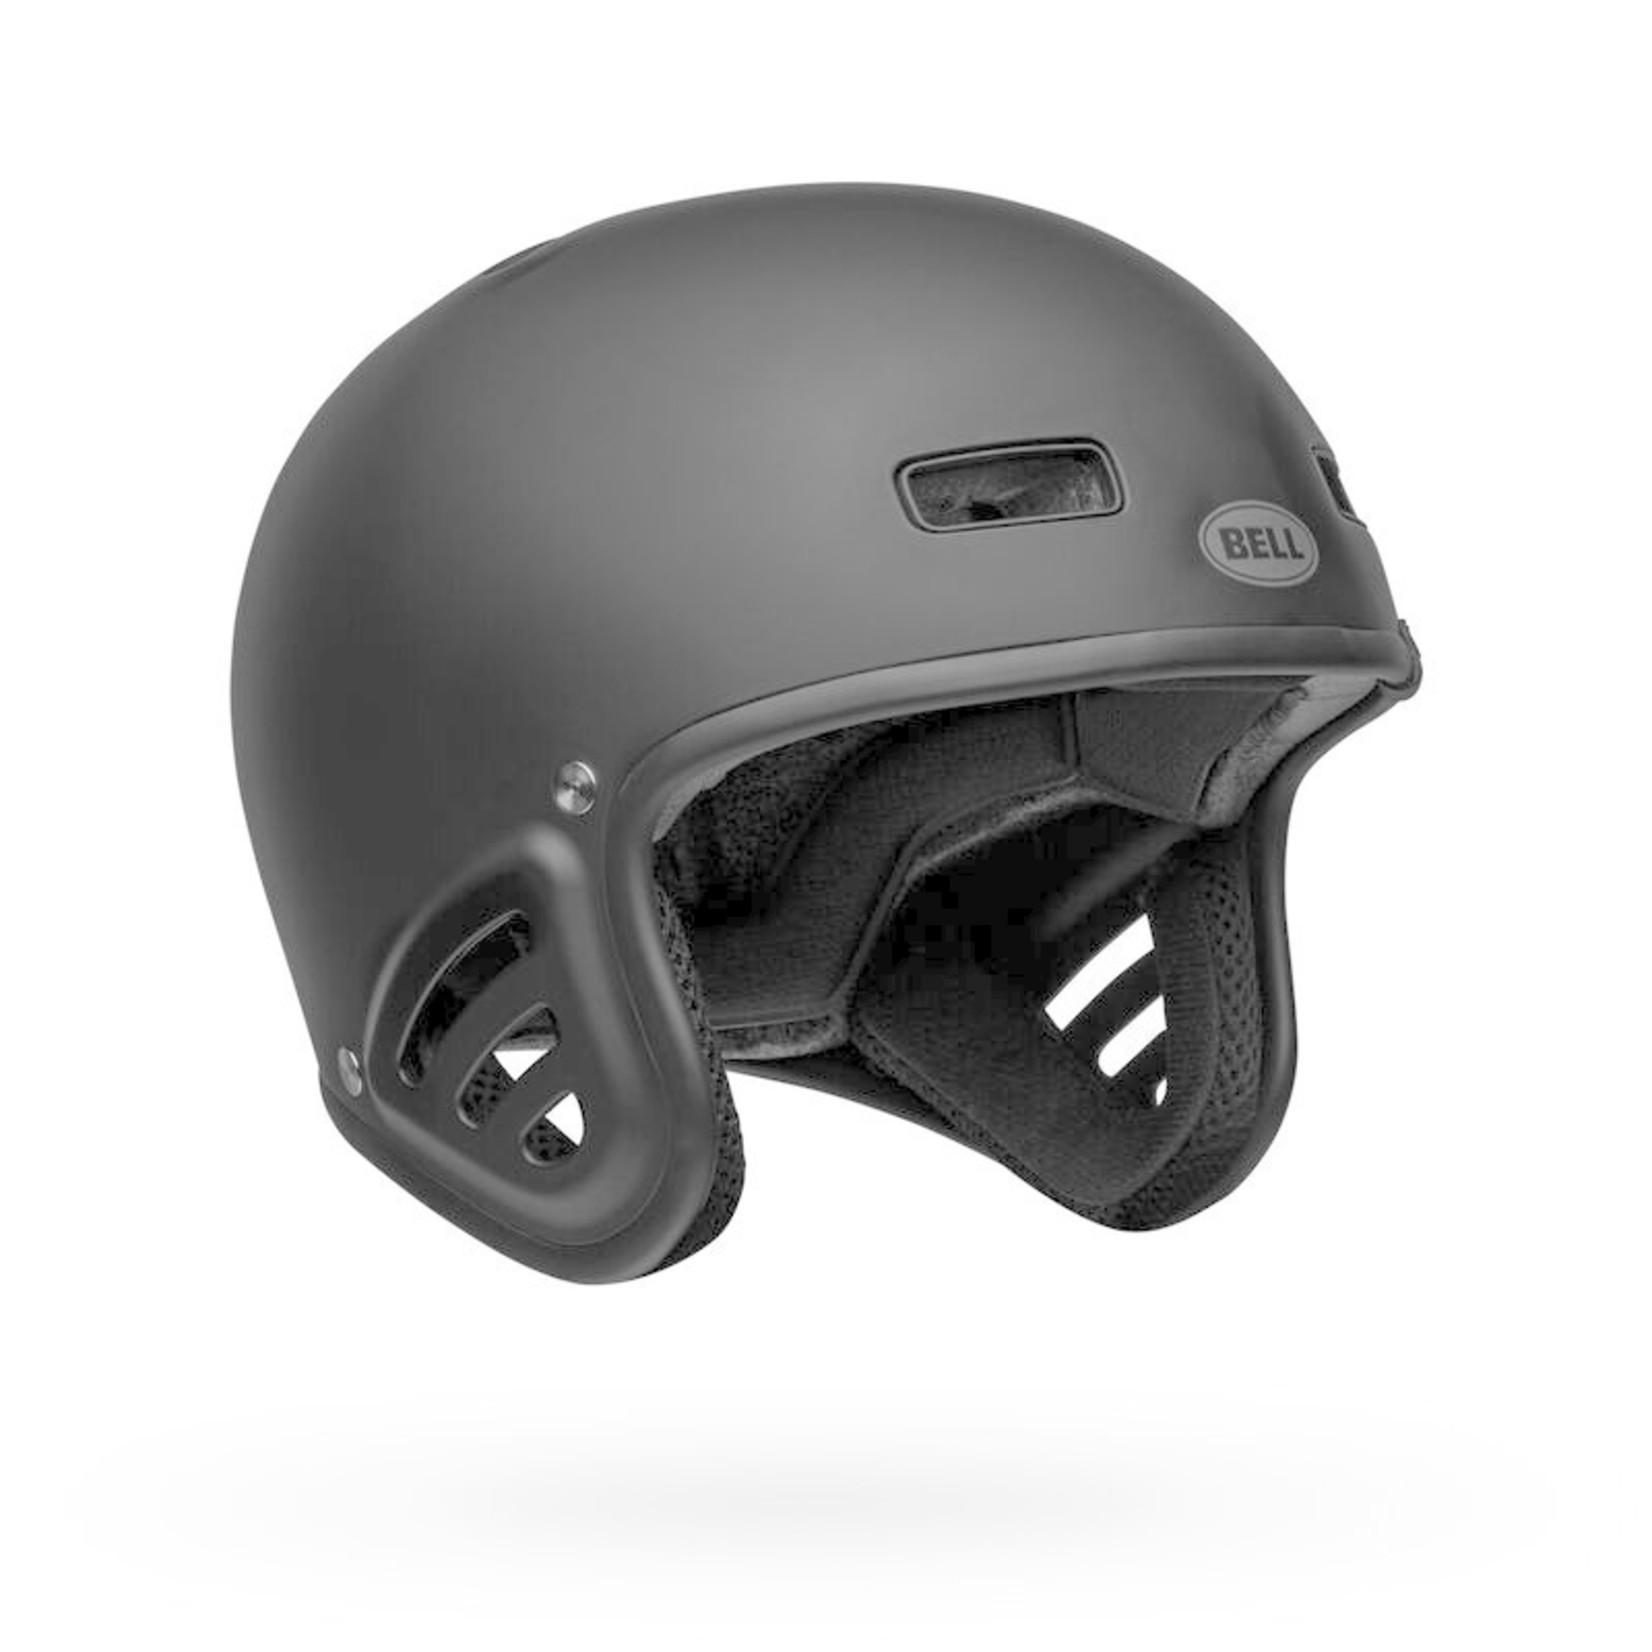 BELL Helmets - Bell Racket MT, Full Cut